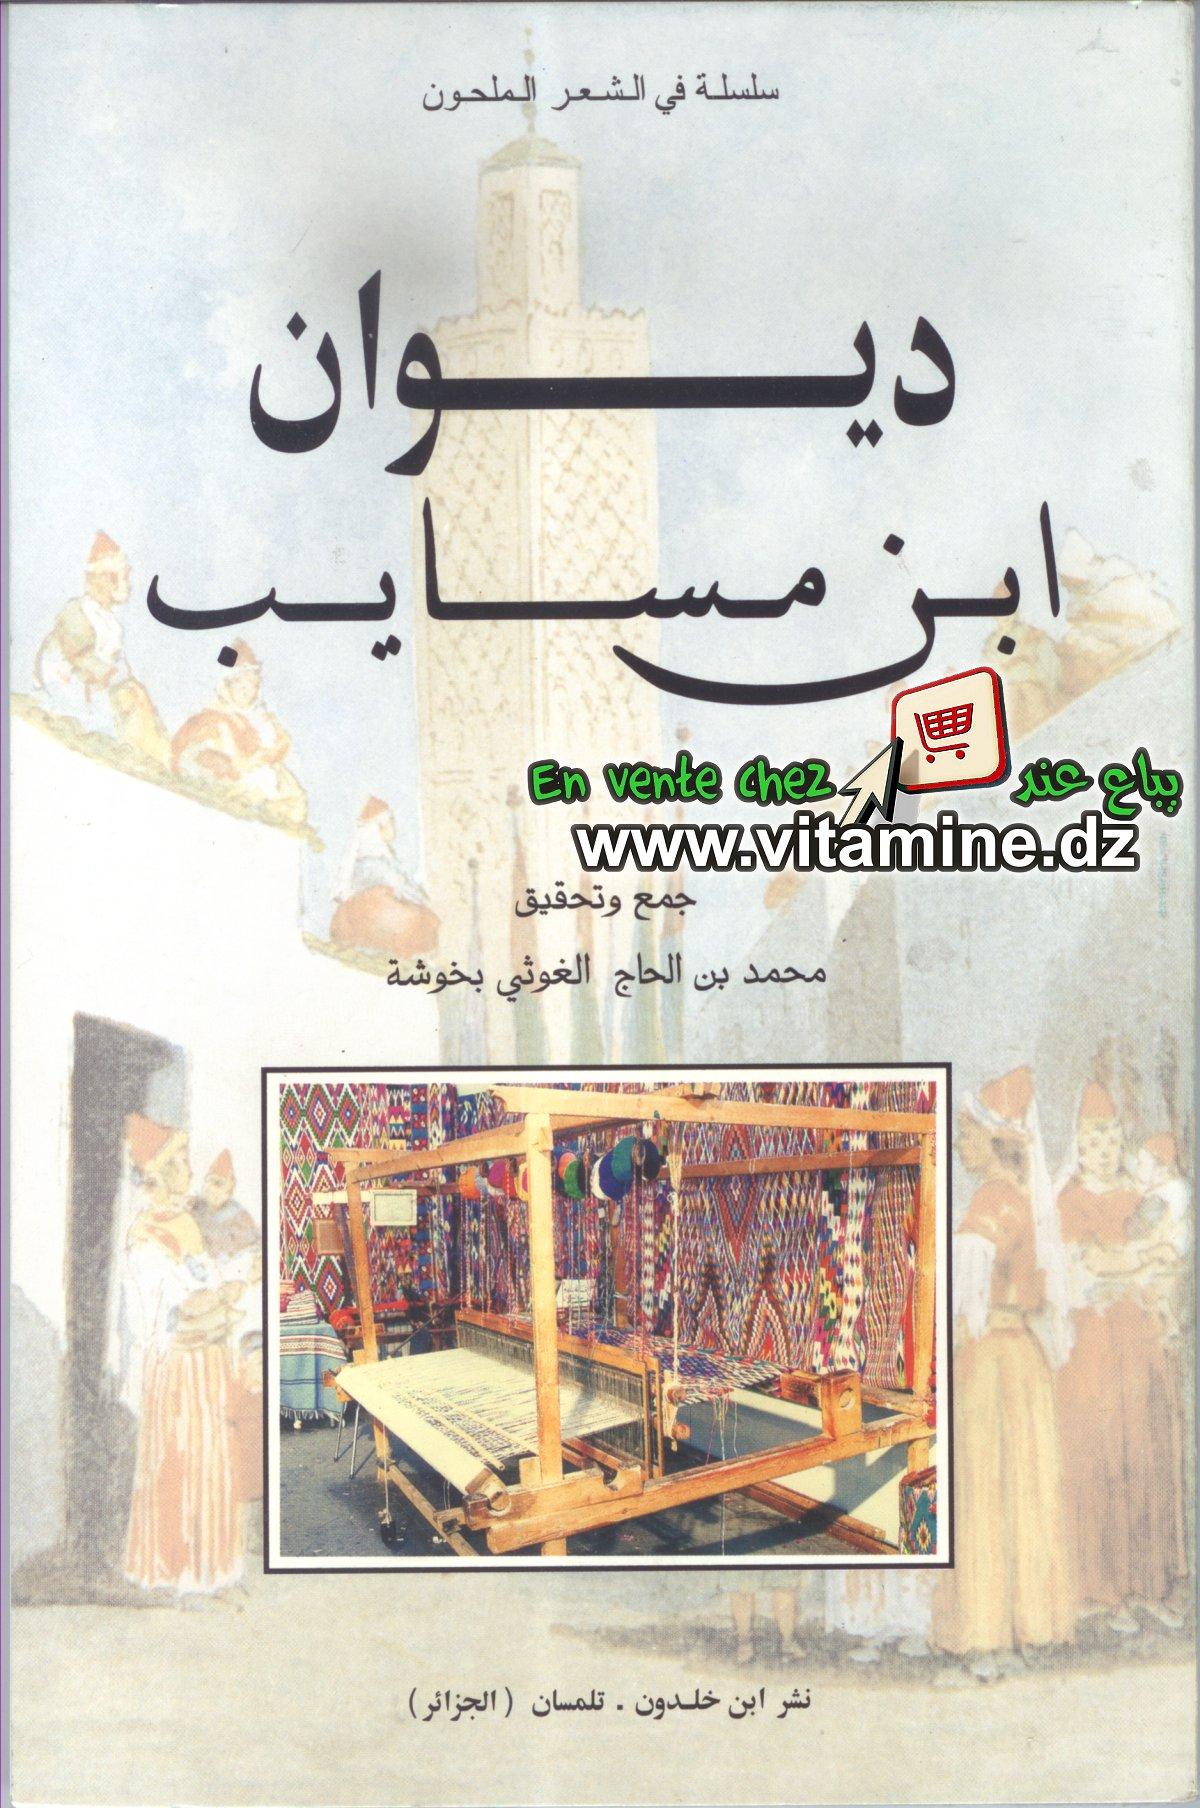 diwane - Ibn Mssayeb